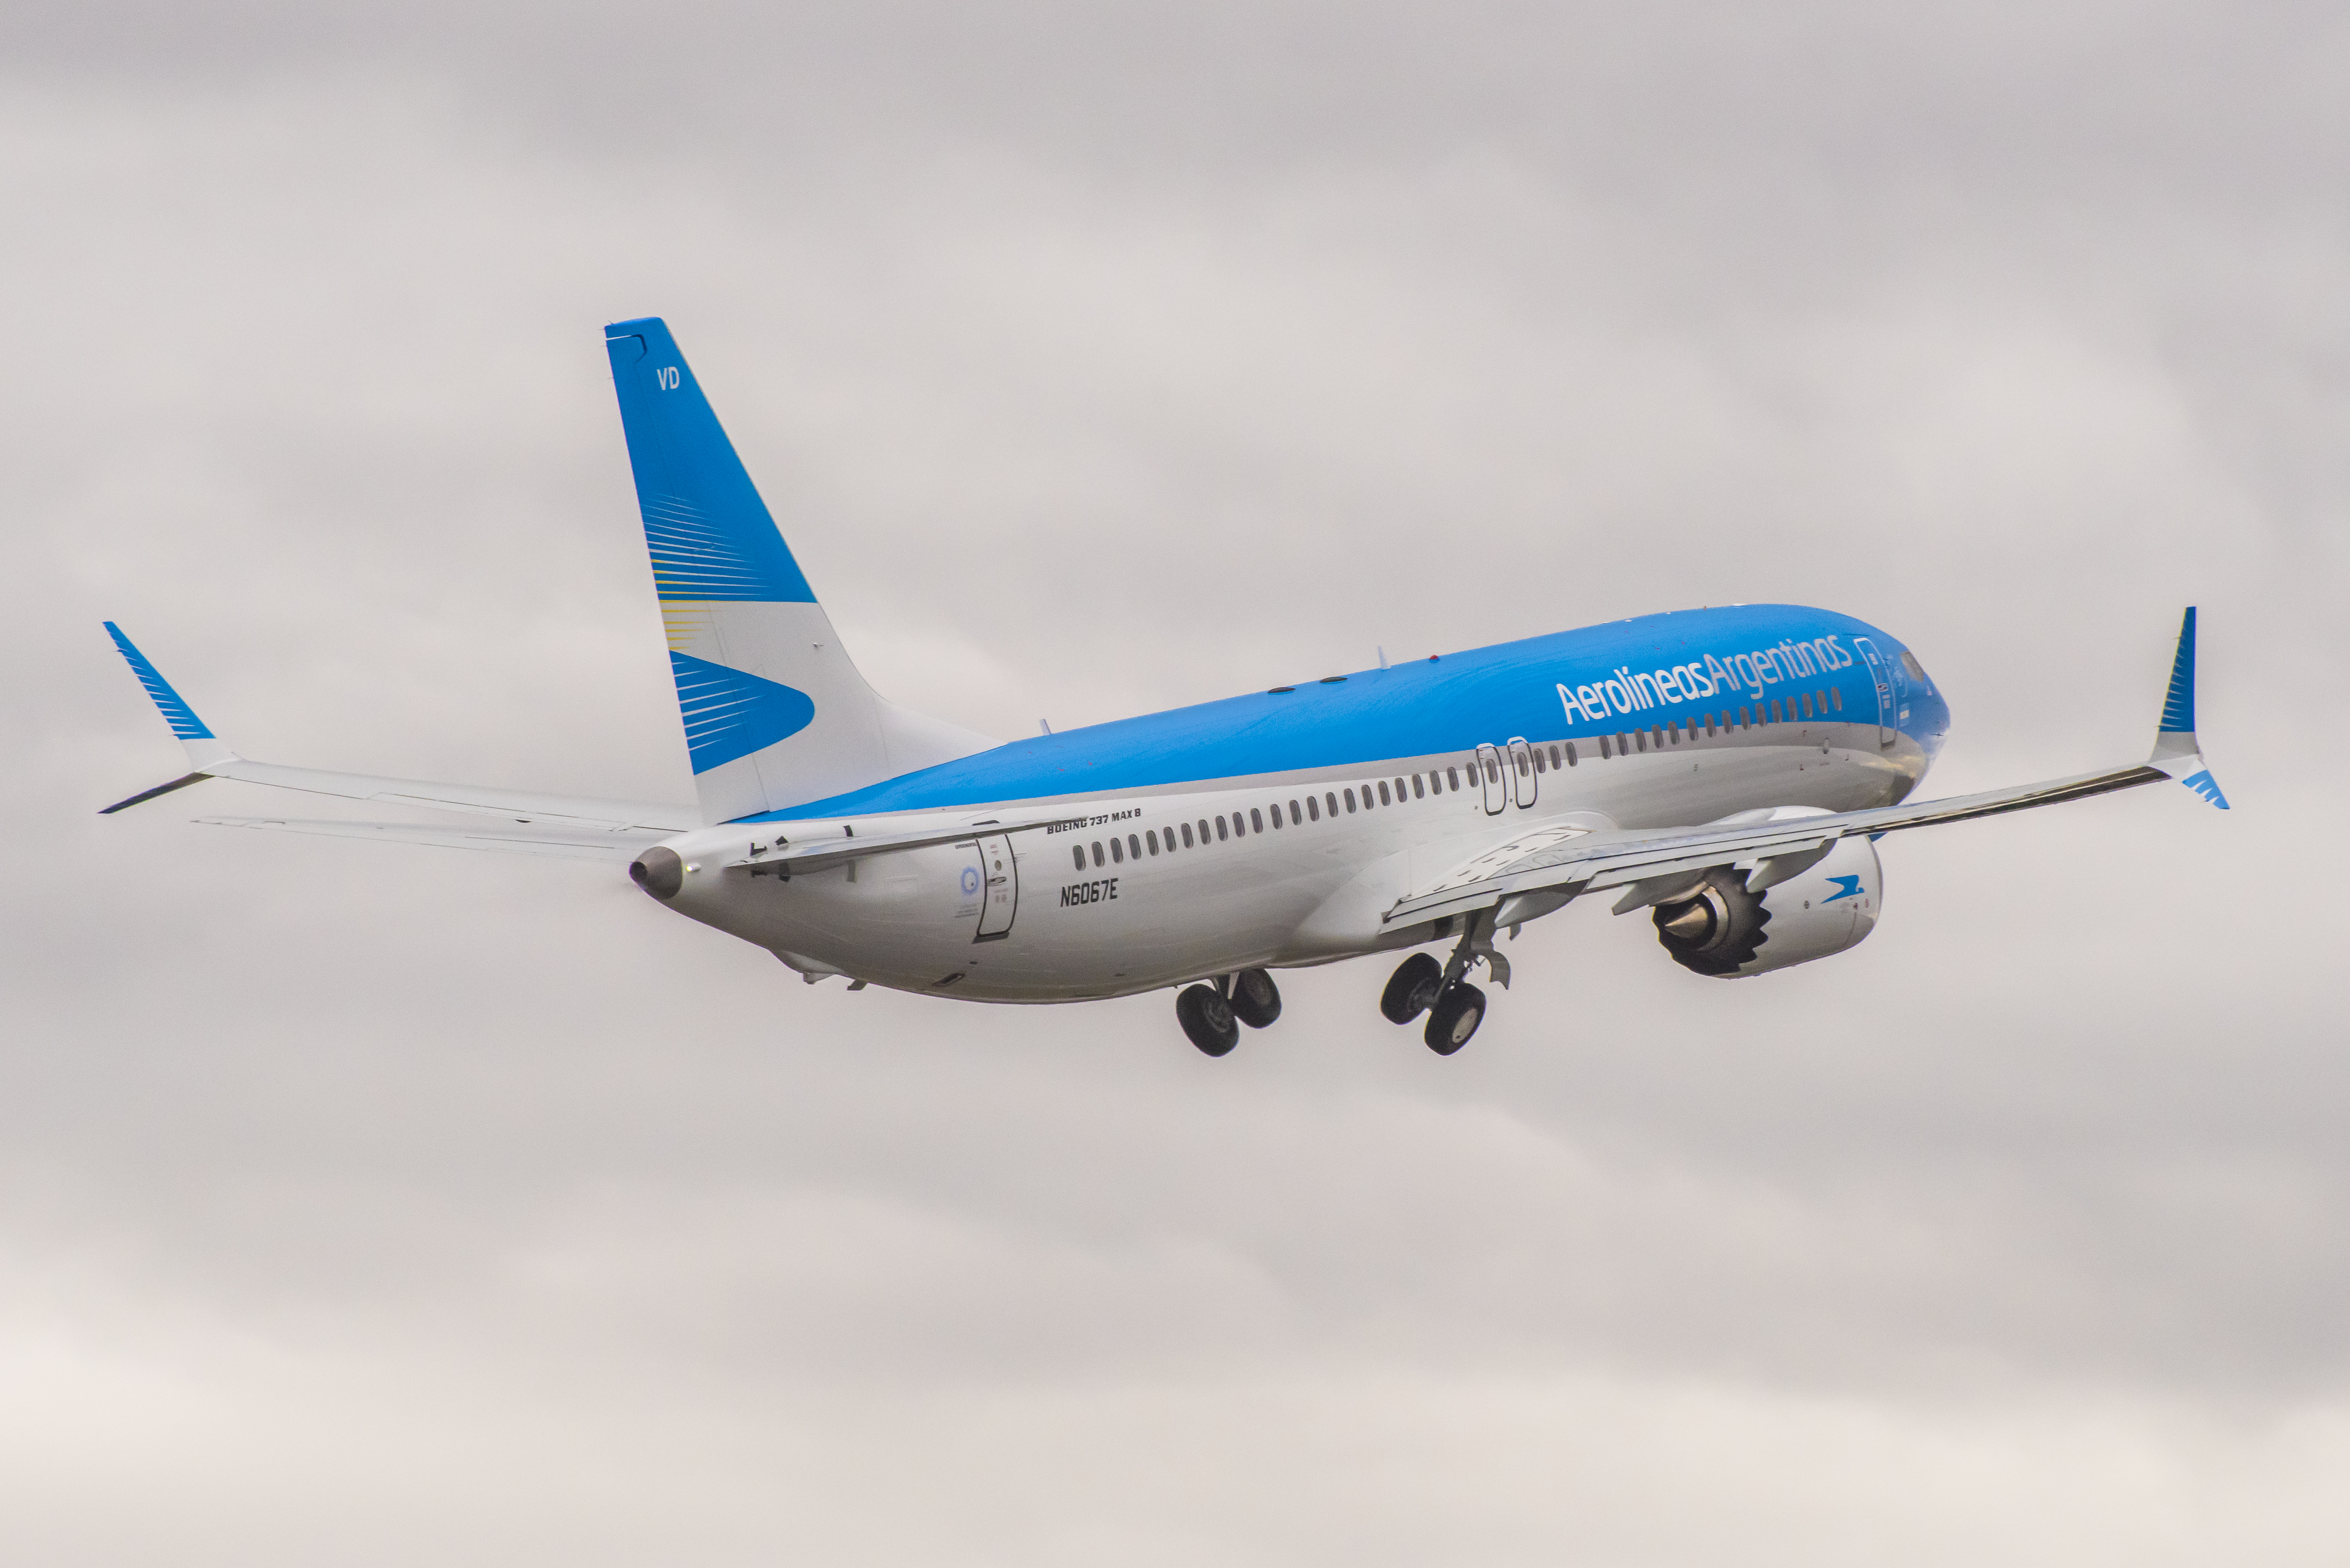 Aerolíneas_Argentinas_6661_ARG_Exteriors